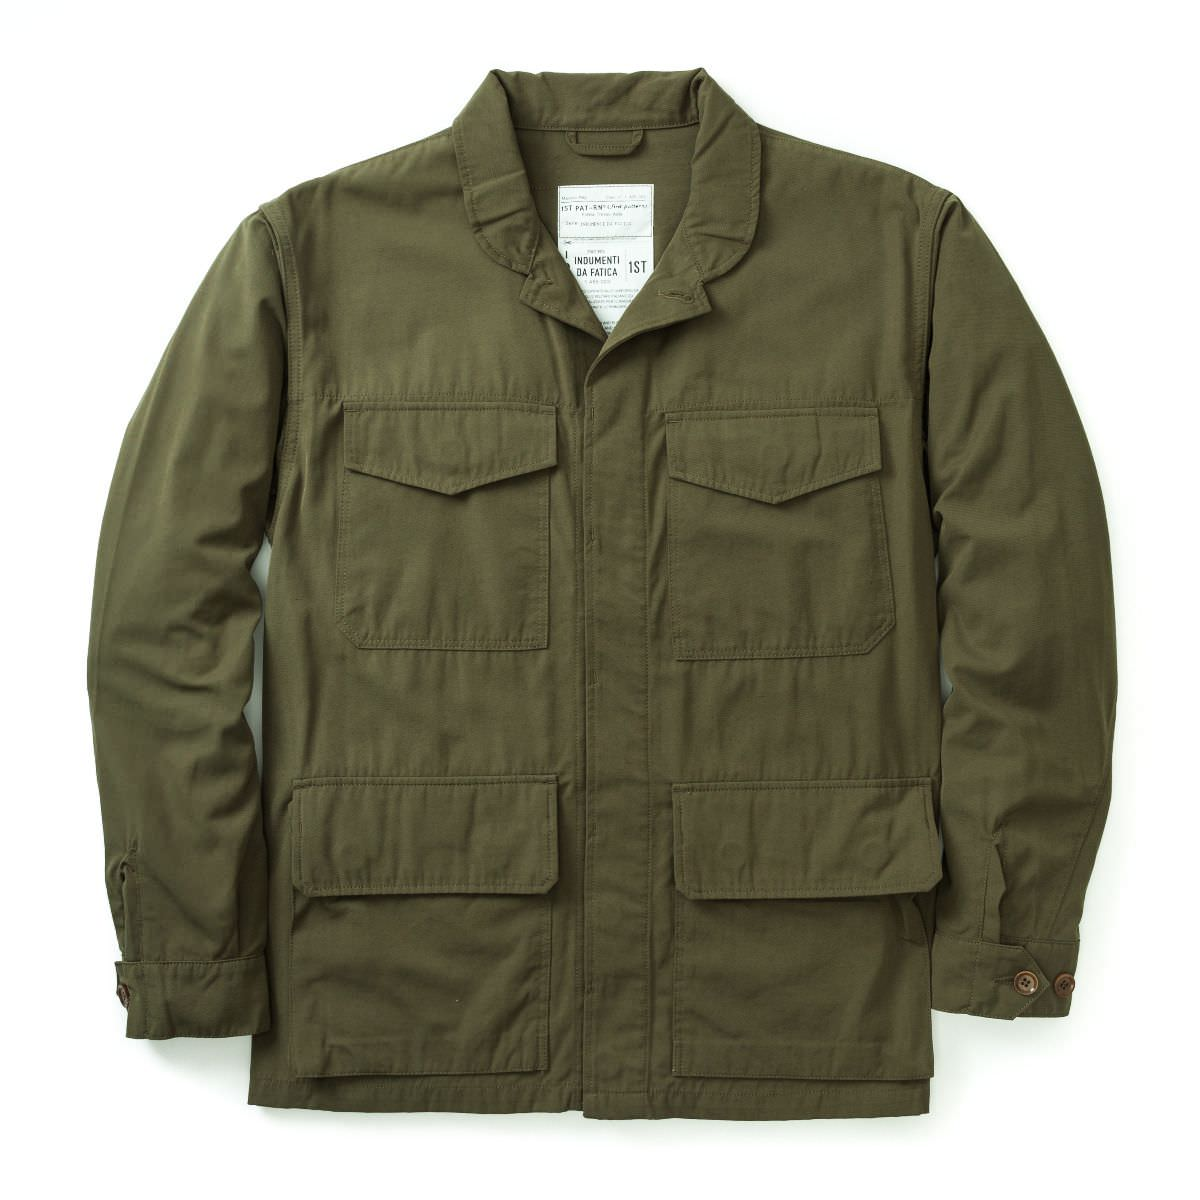 1ST PAT-RN campo field jacket